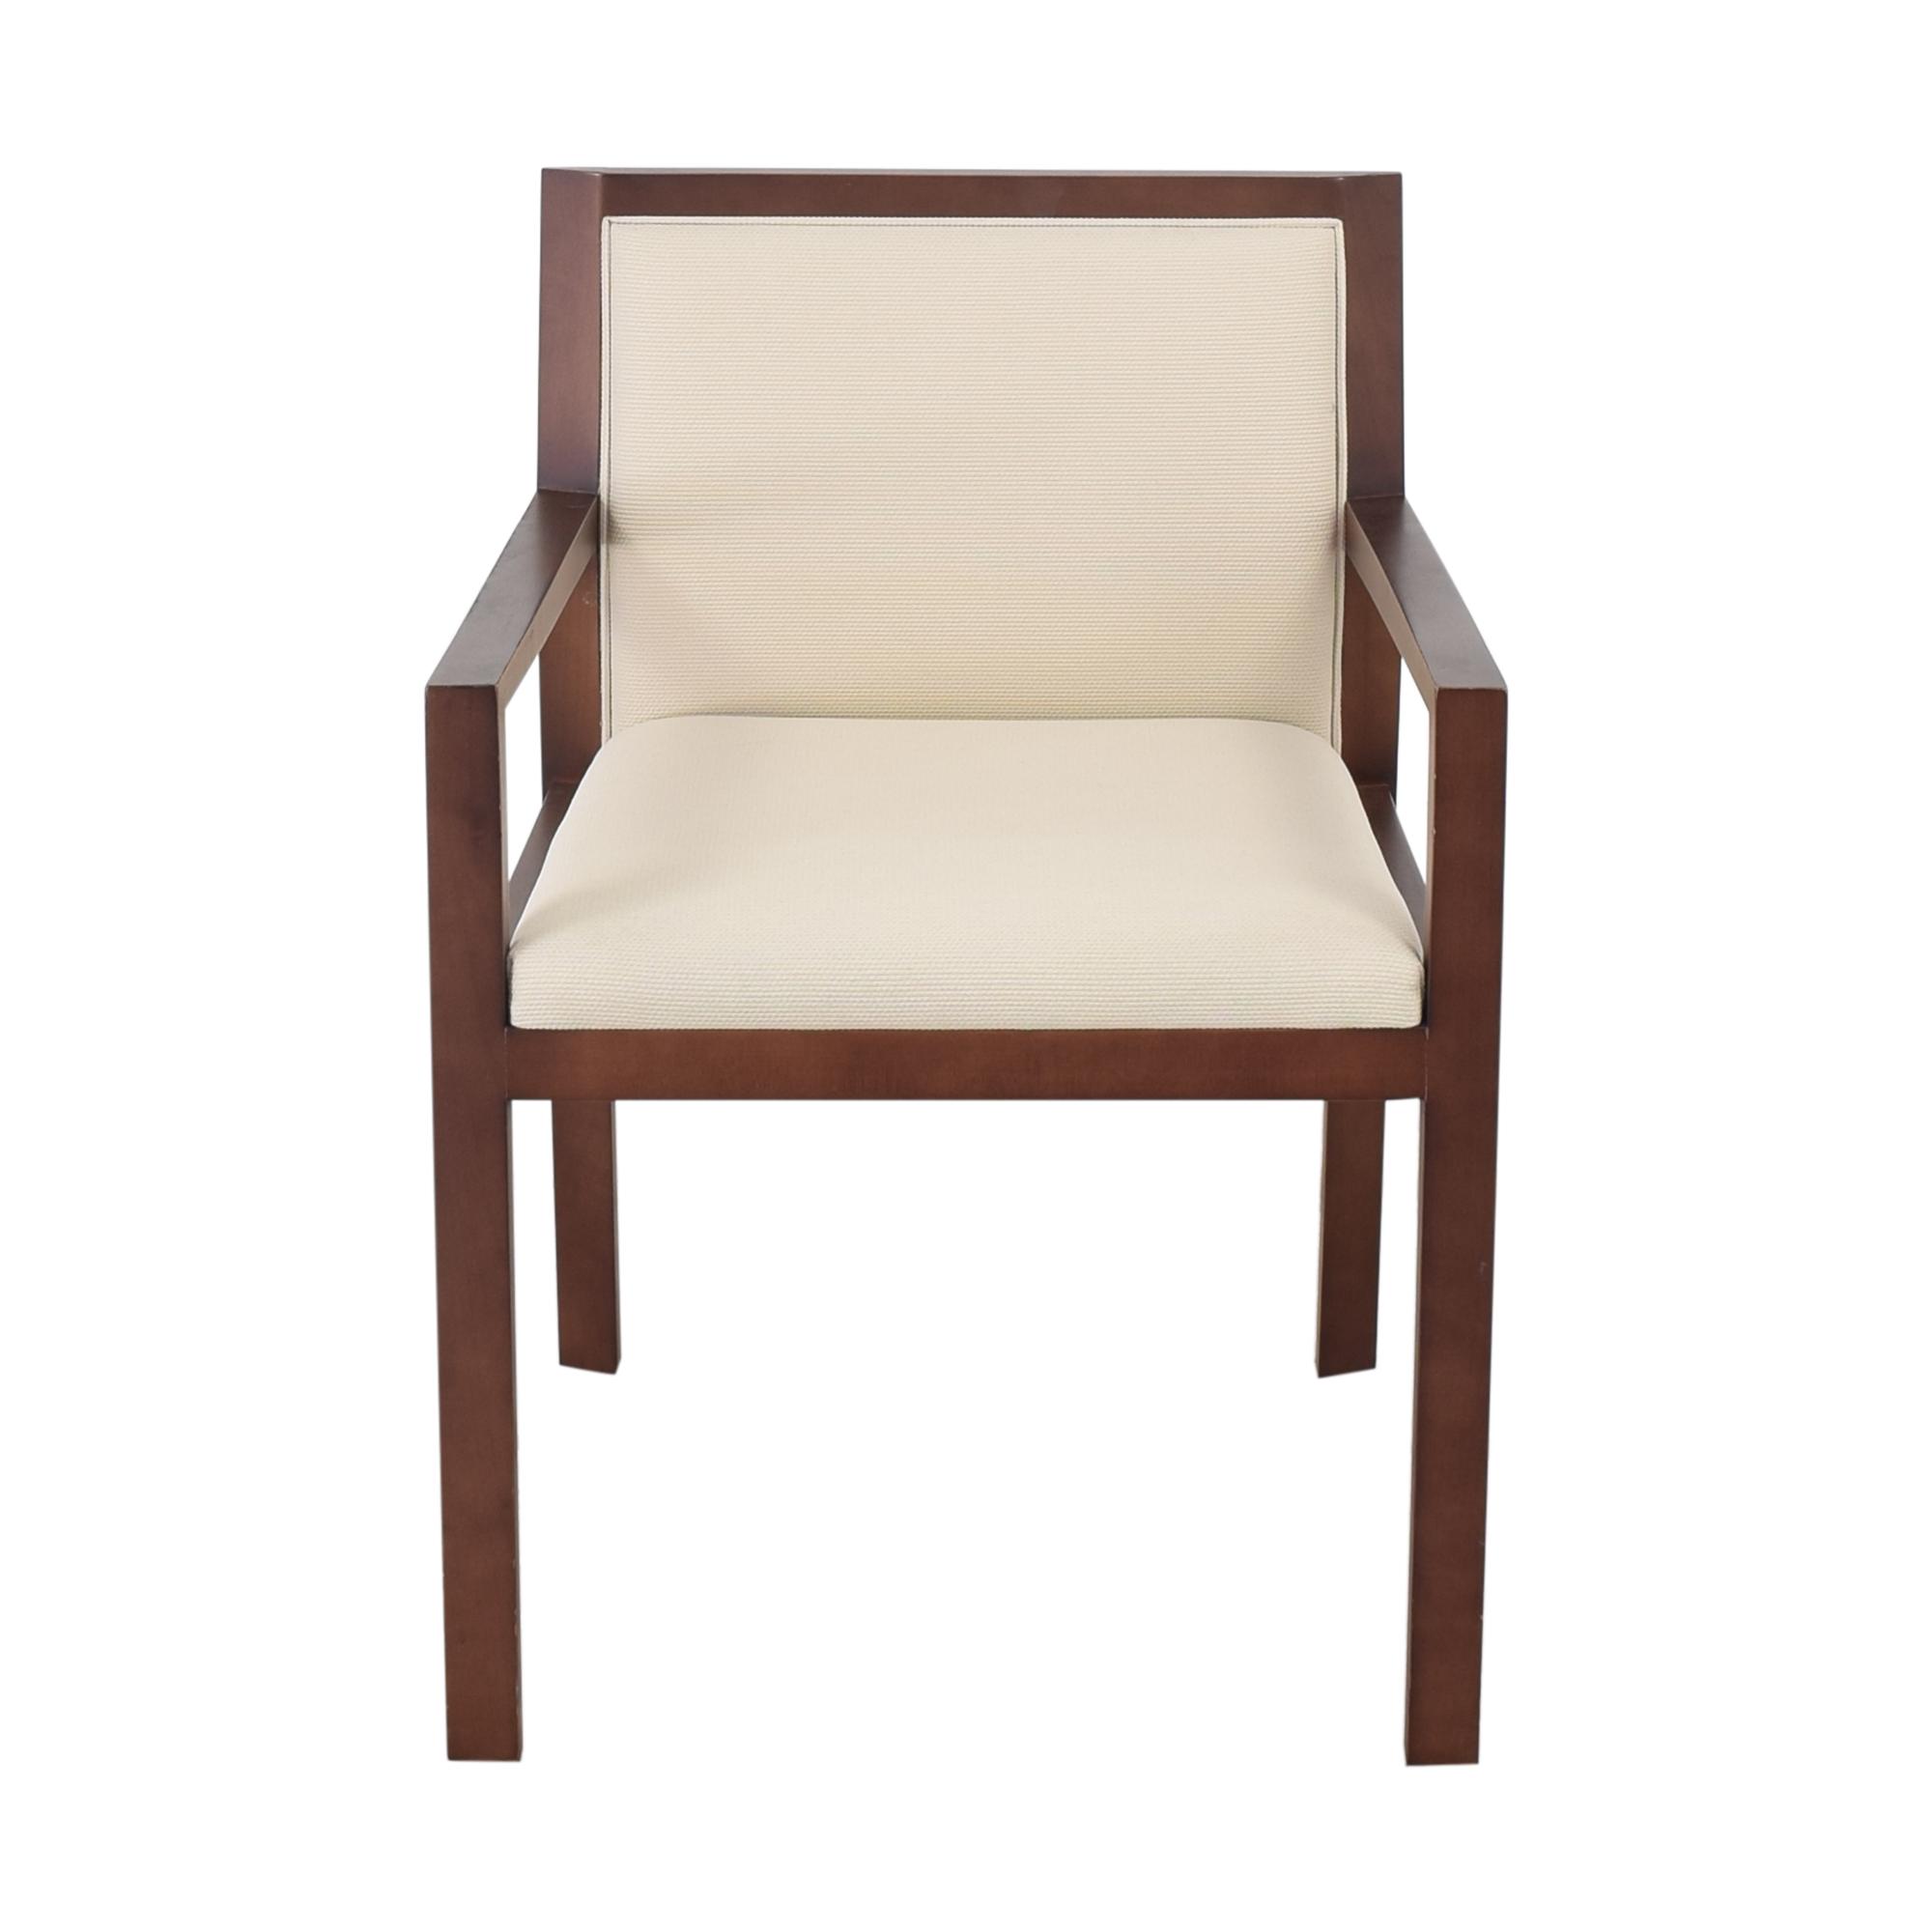 shop Bernhardt Fabric Desk Chair Bernhardt Chairs